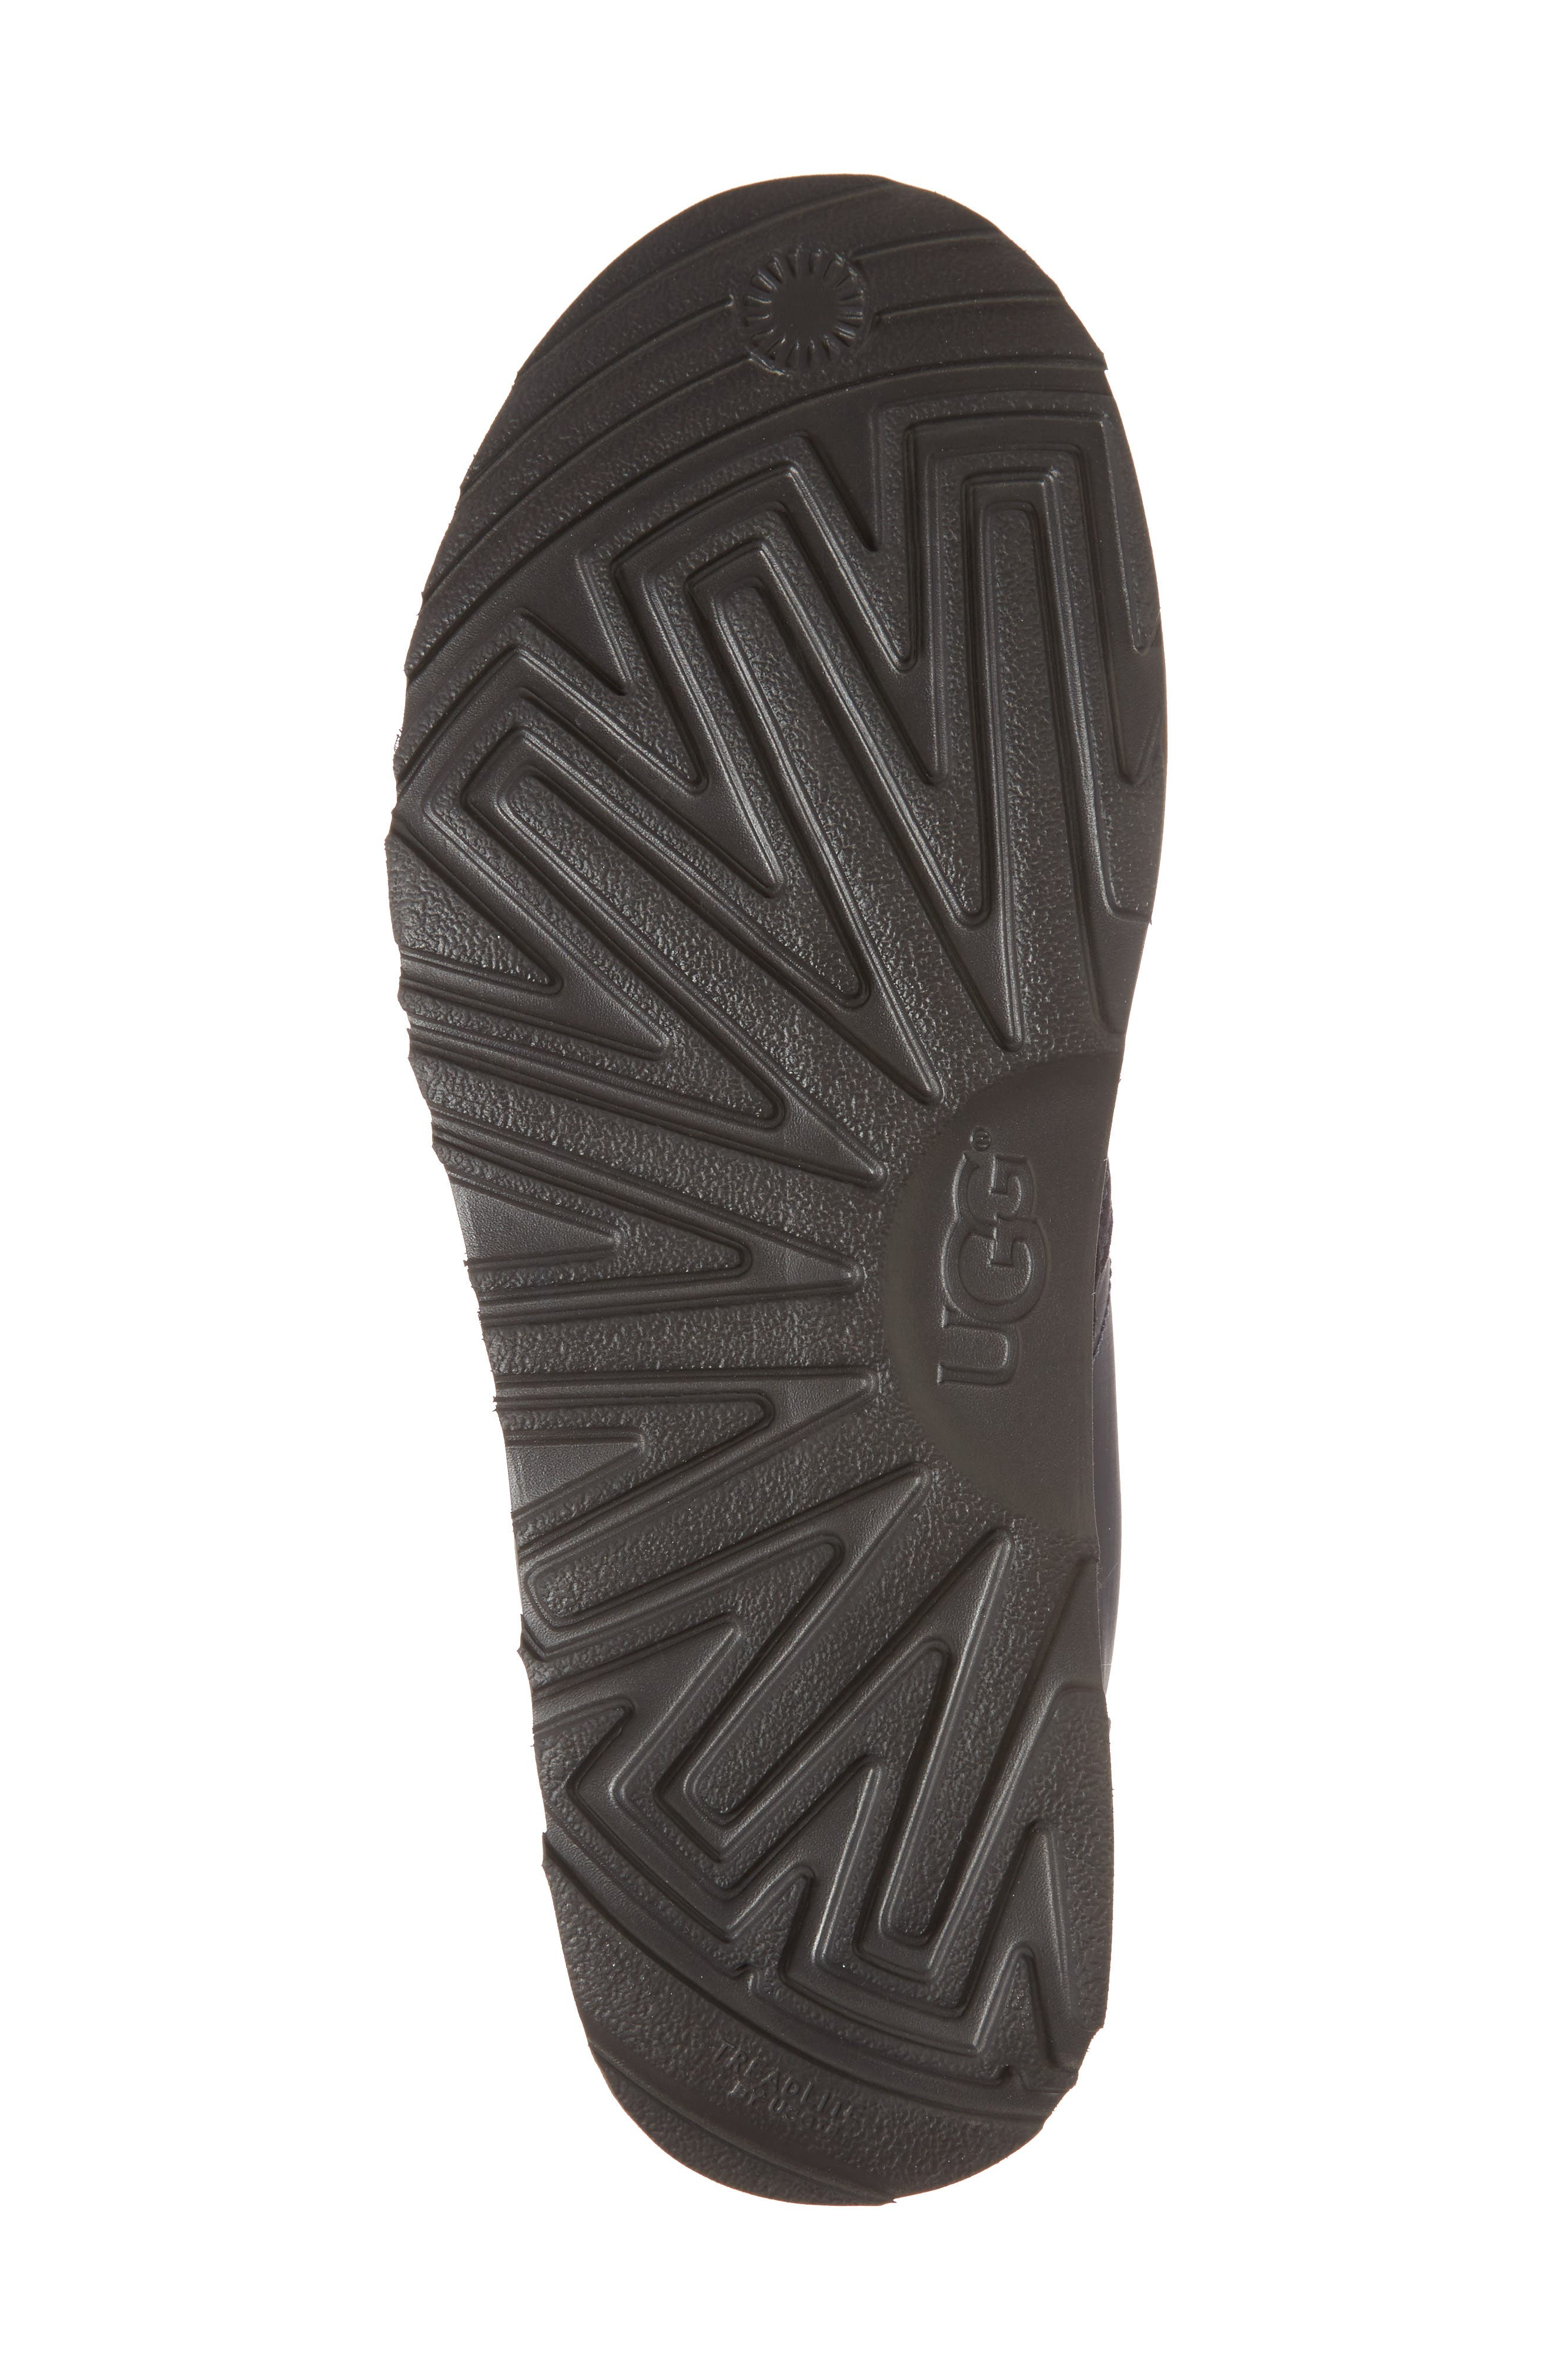 Neumel Ripstop Chukka Boot,                             Alternate thumbnail 6, color,                             True Navy Leather